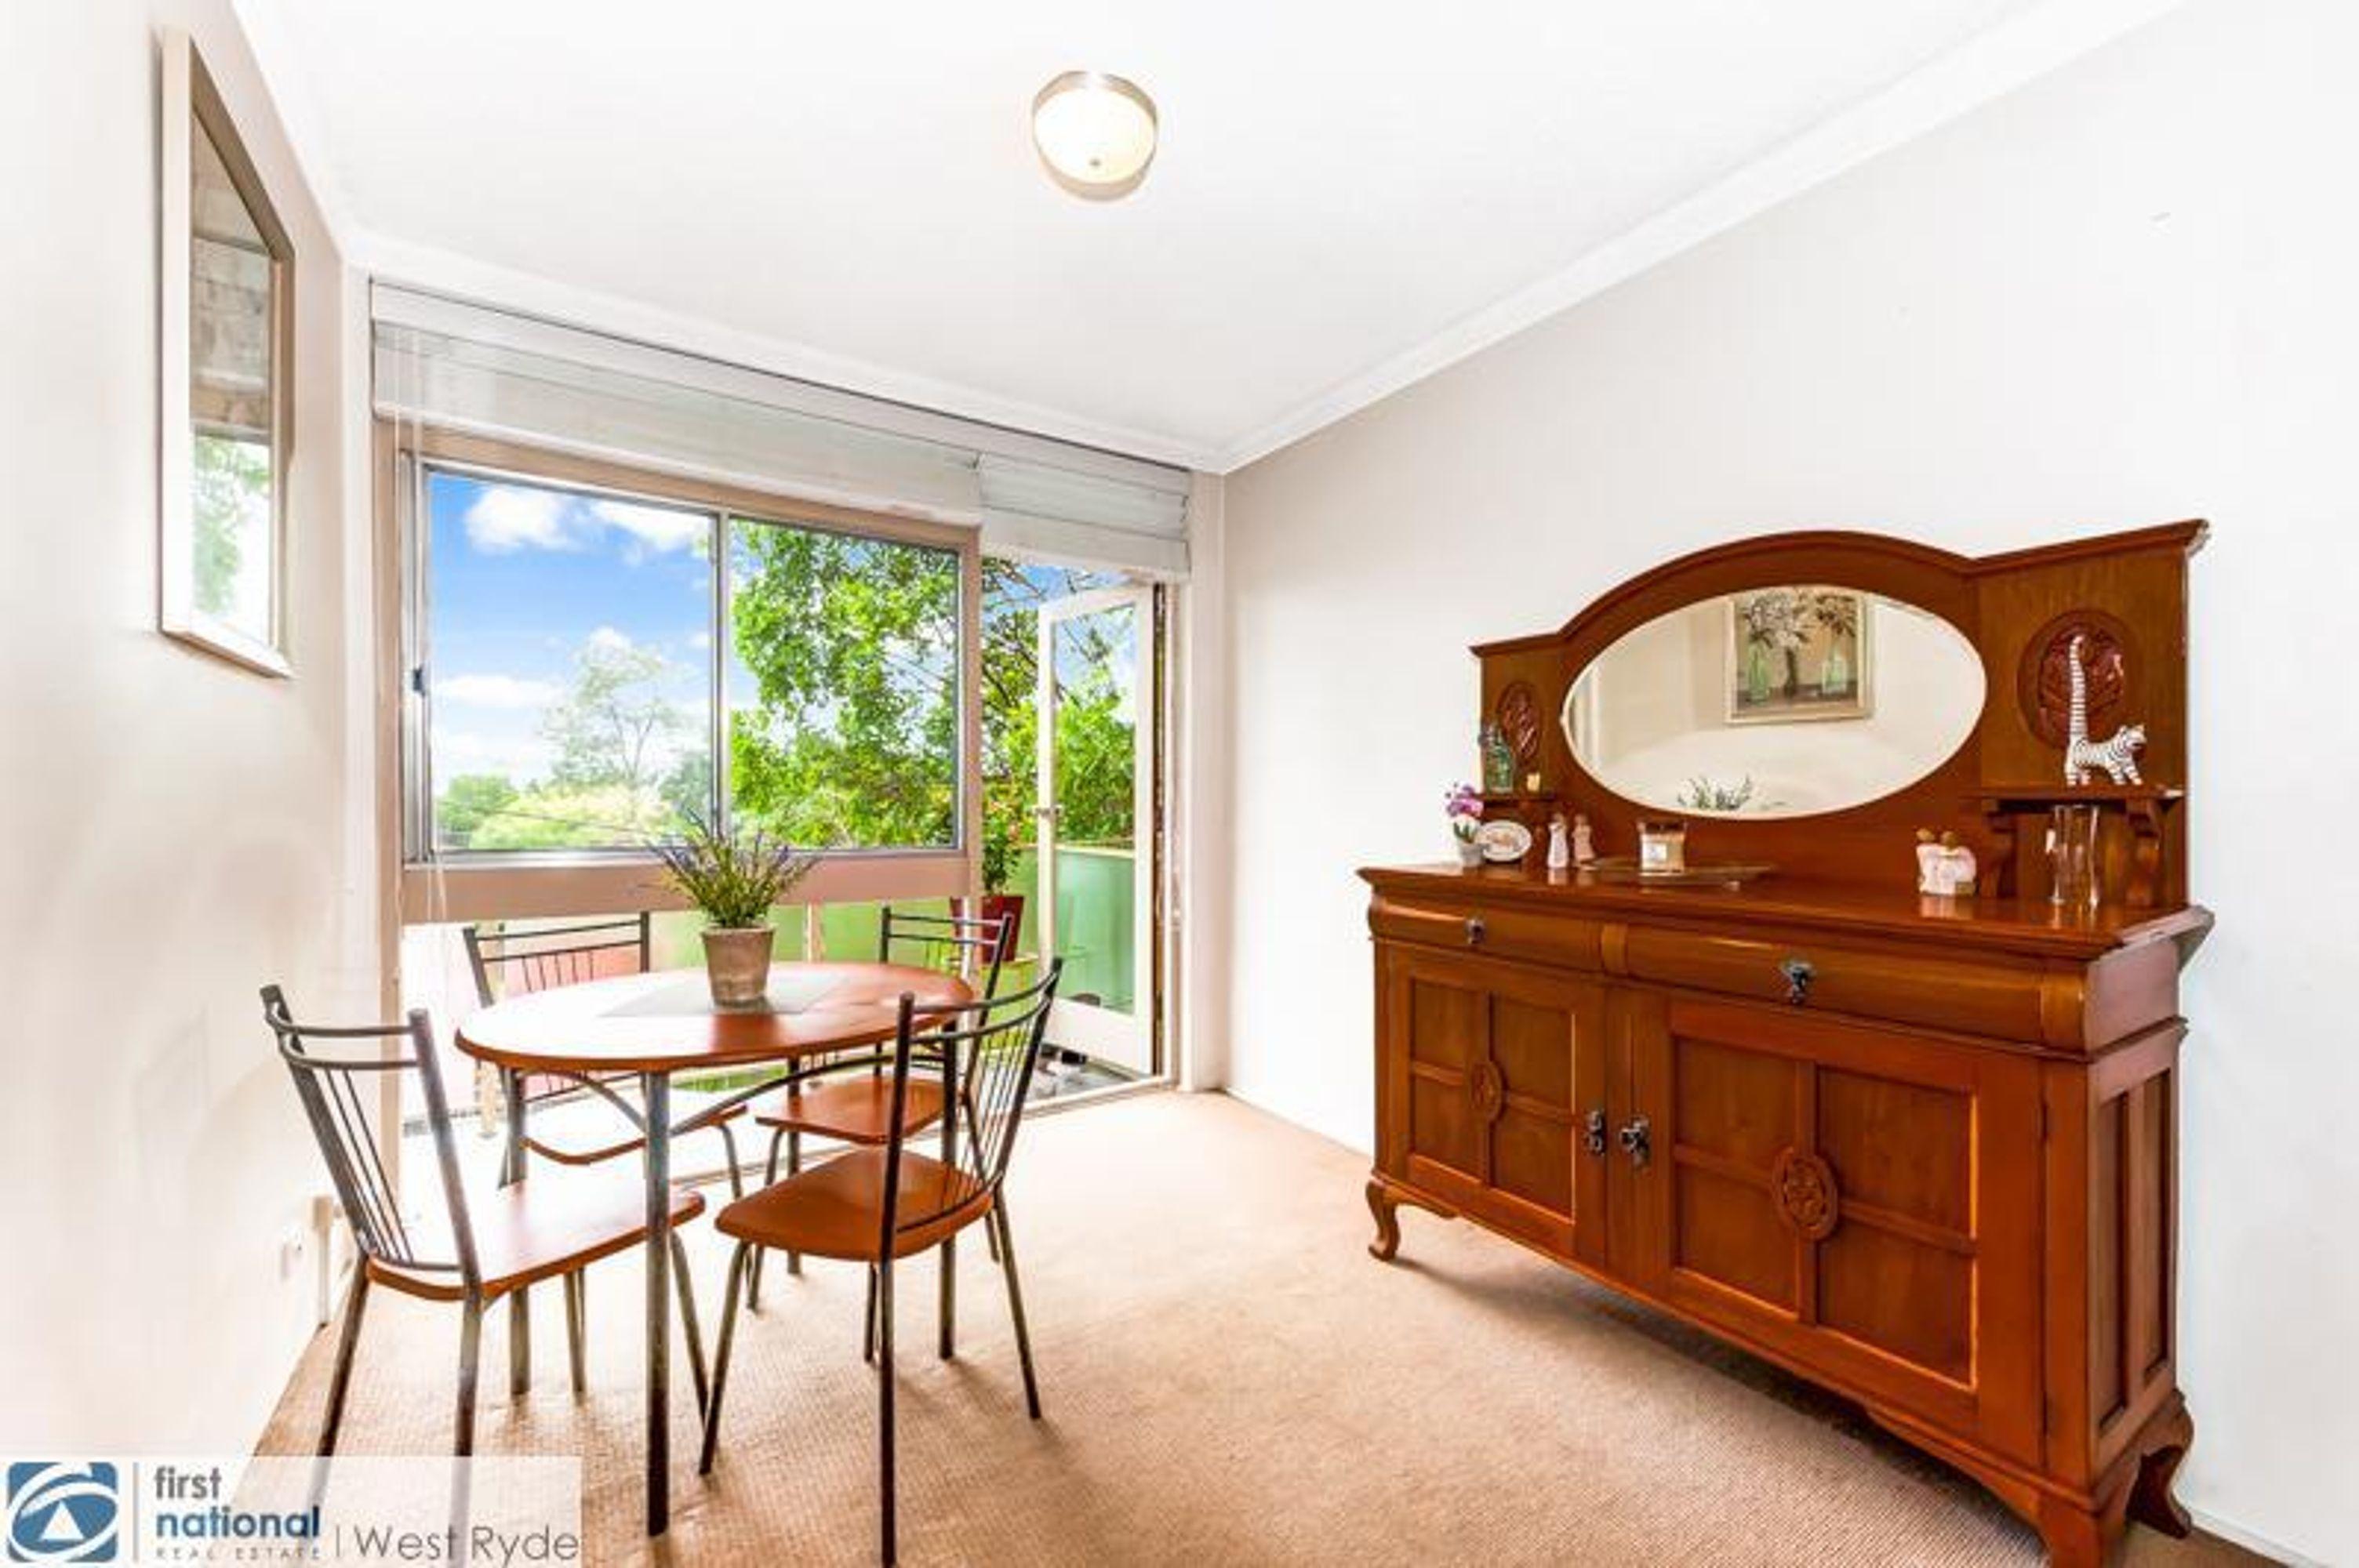 1/8 Lane Cove Road, Ryde, NSW 2112